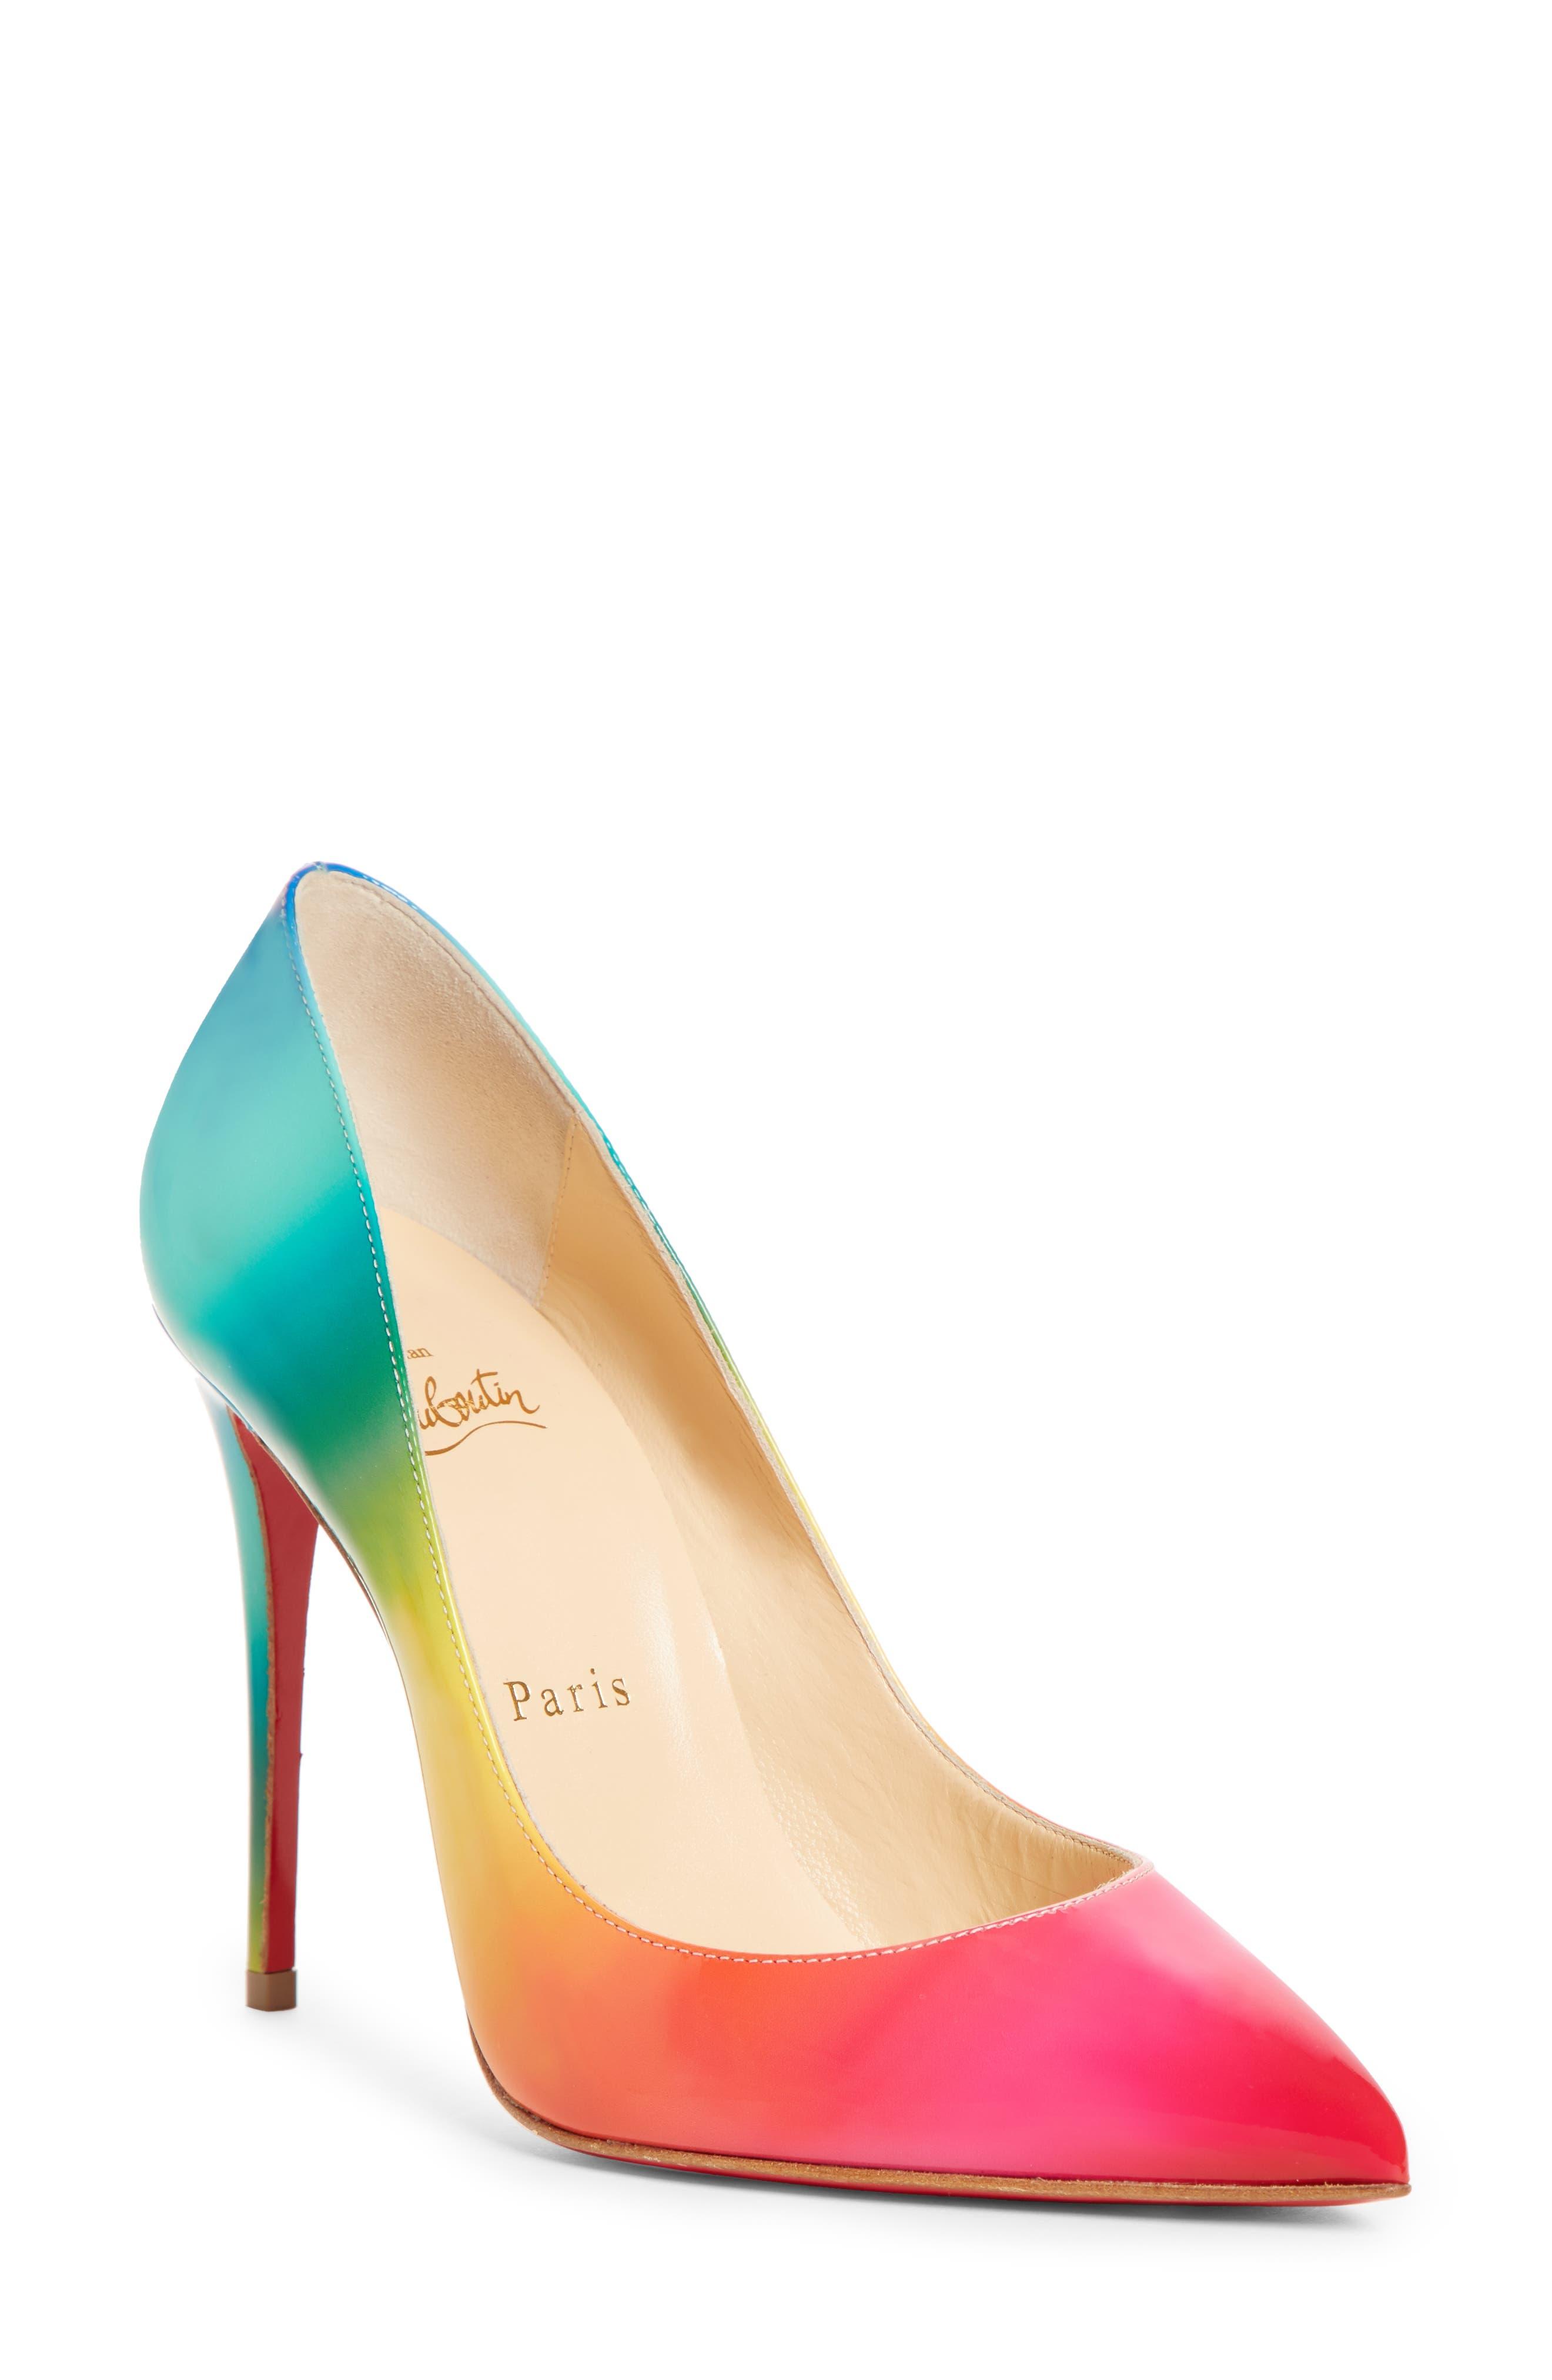 Christian Louboutin Pigalle Follies Rainbow Pump, Pink